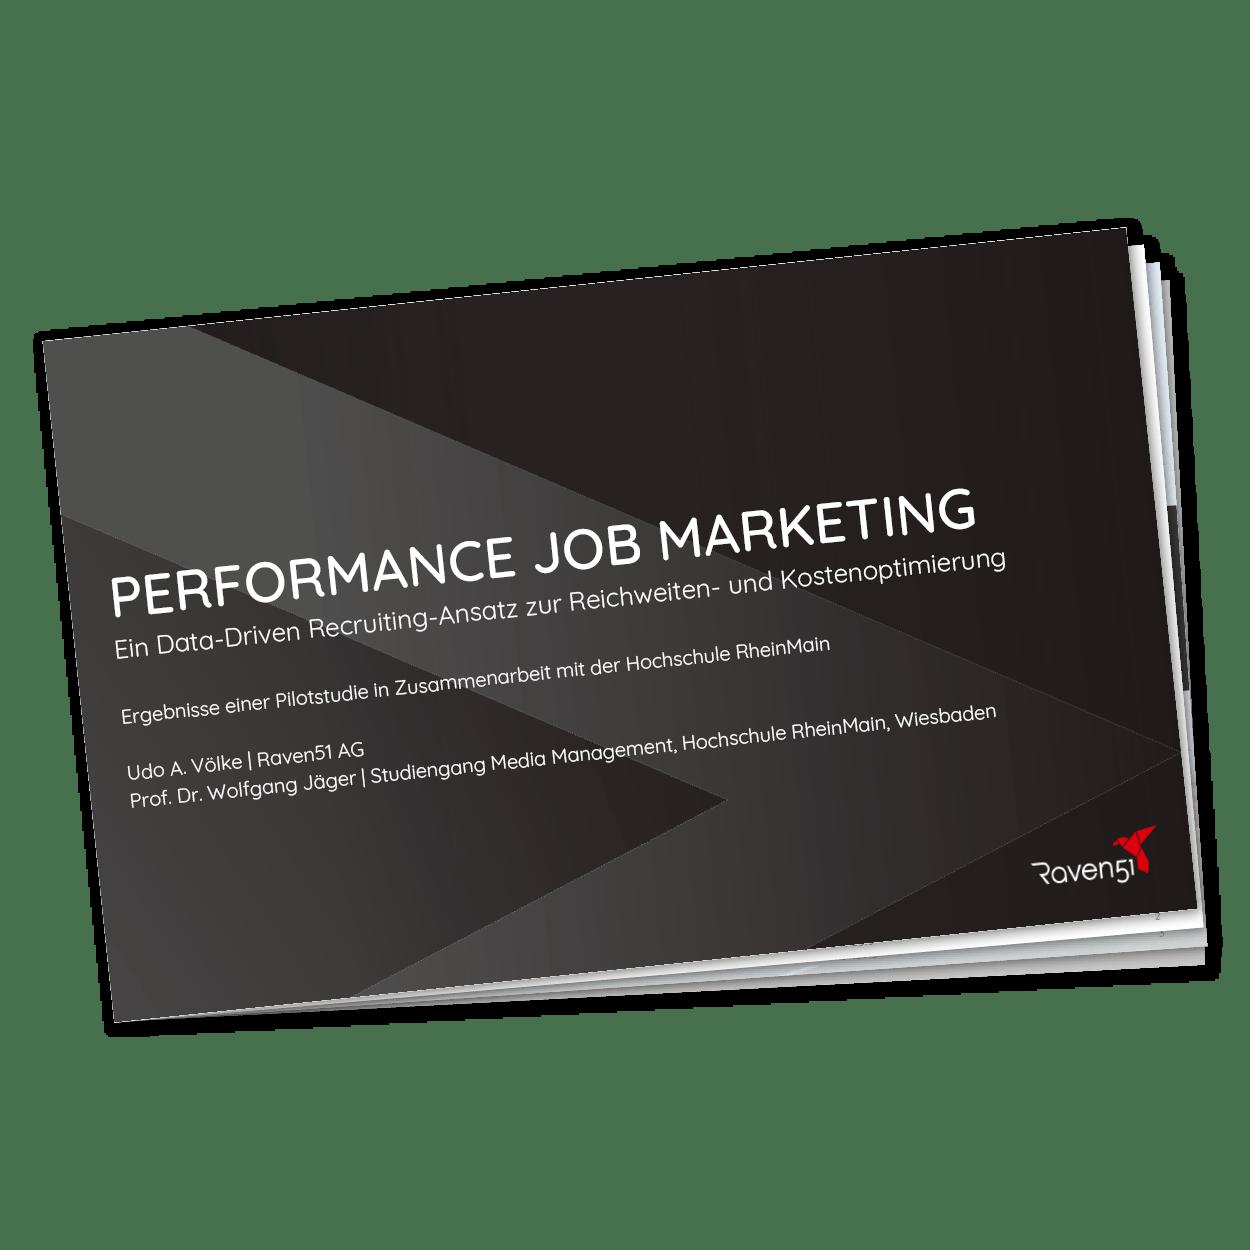 Raven51 - Studie Performance-Job-Marketing